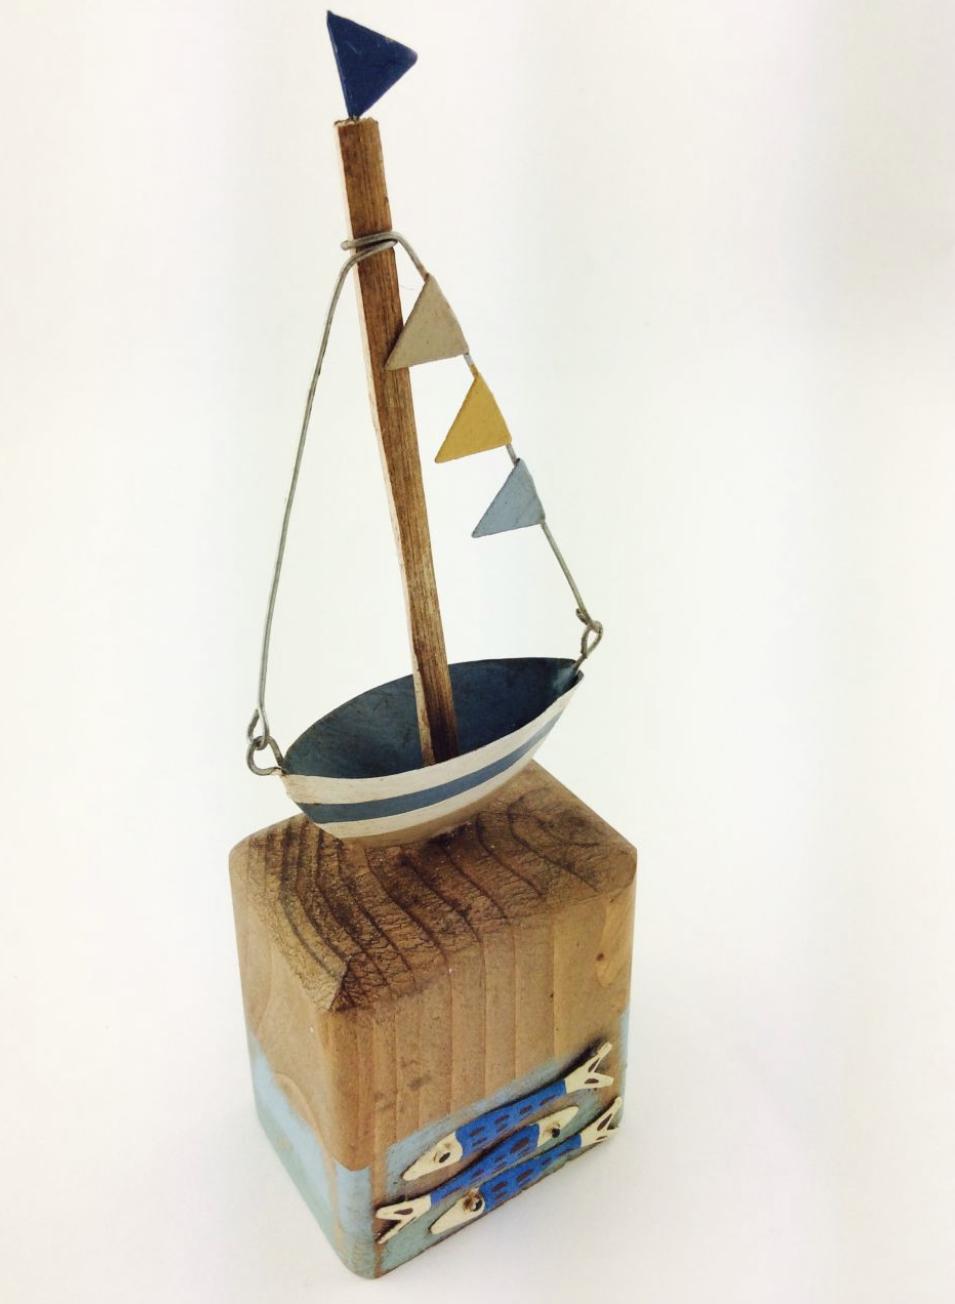 Flagged yacht on wooden block ornament by  shoeless joe